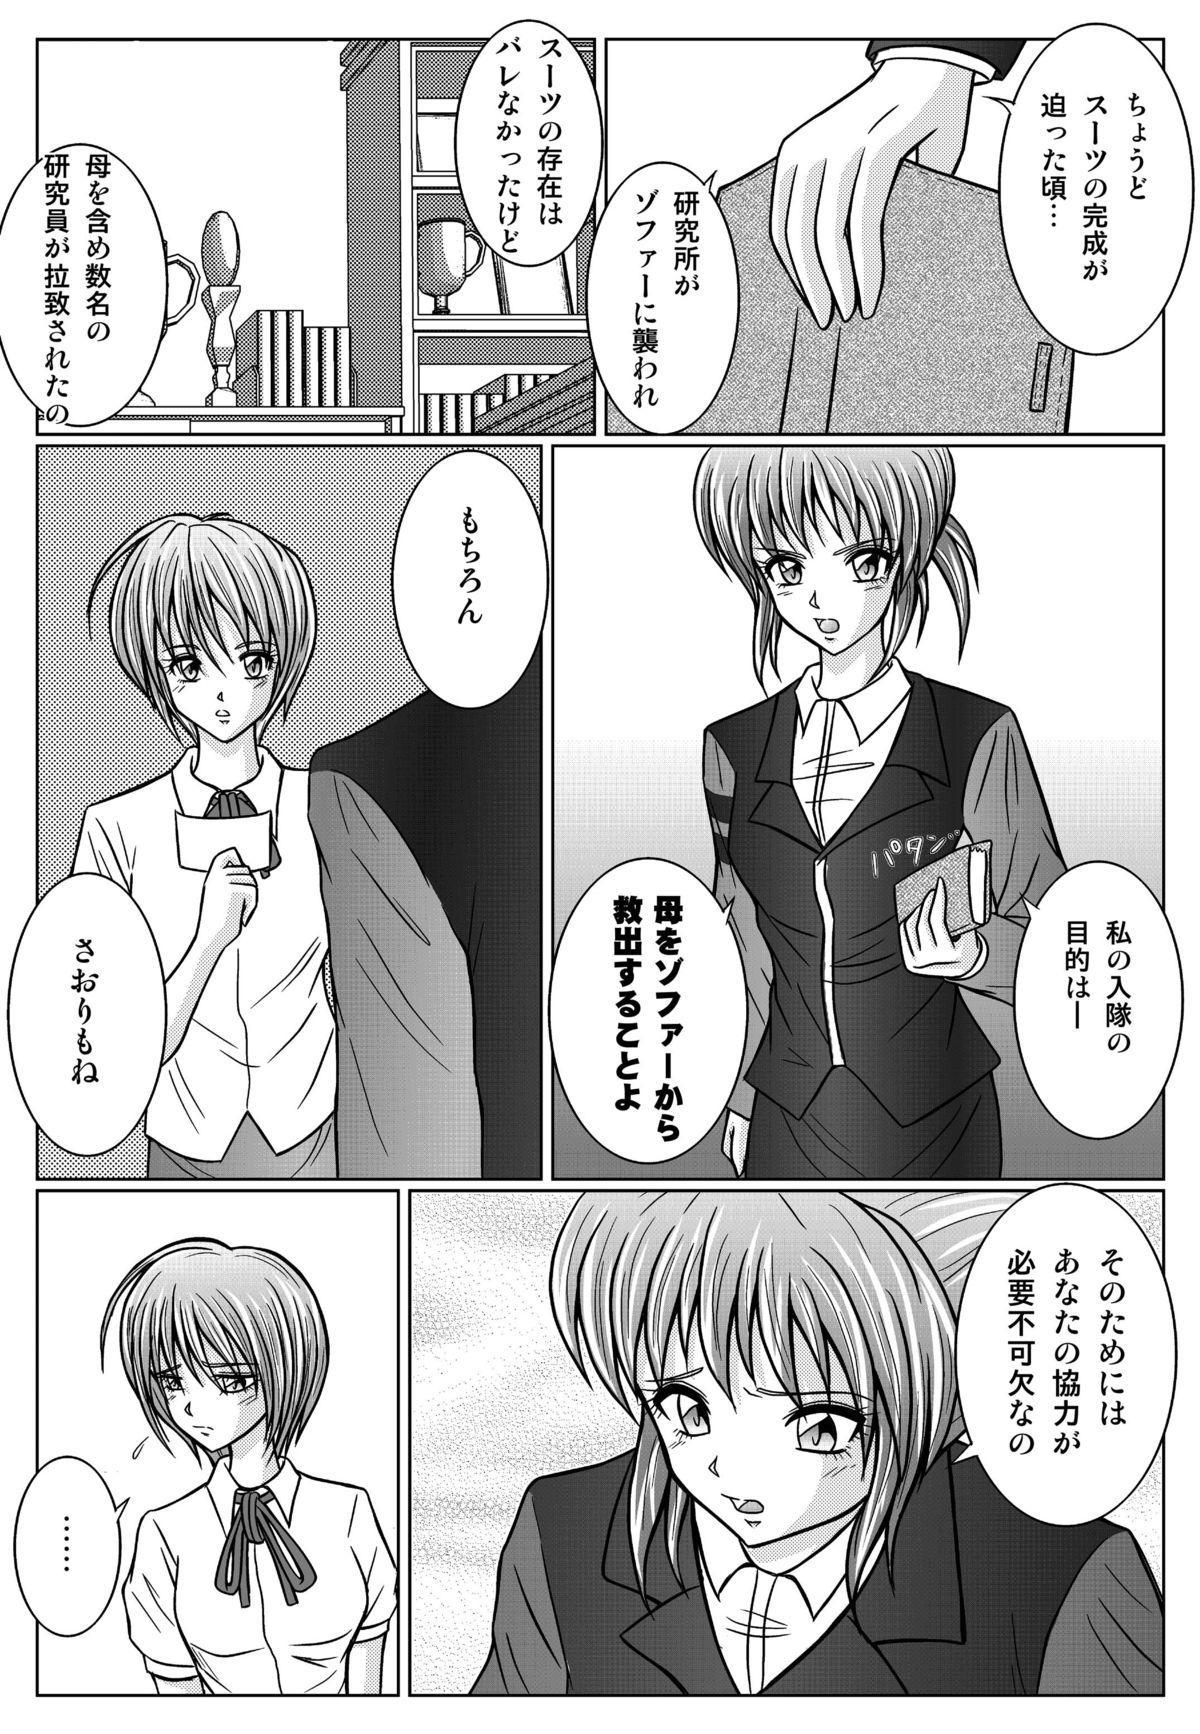 [Macxe's (monmon)] Tokubousentai Dinaranger ~Heroine Kairaku Sennou Keikaku~ Vol.01/02/03 (Renkaban) [Digital] 81